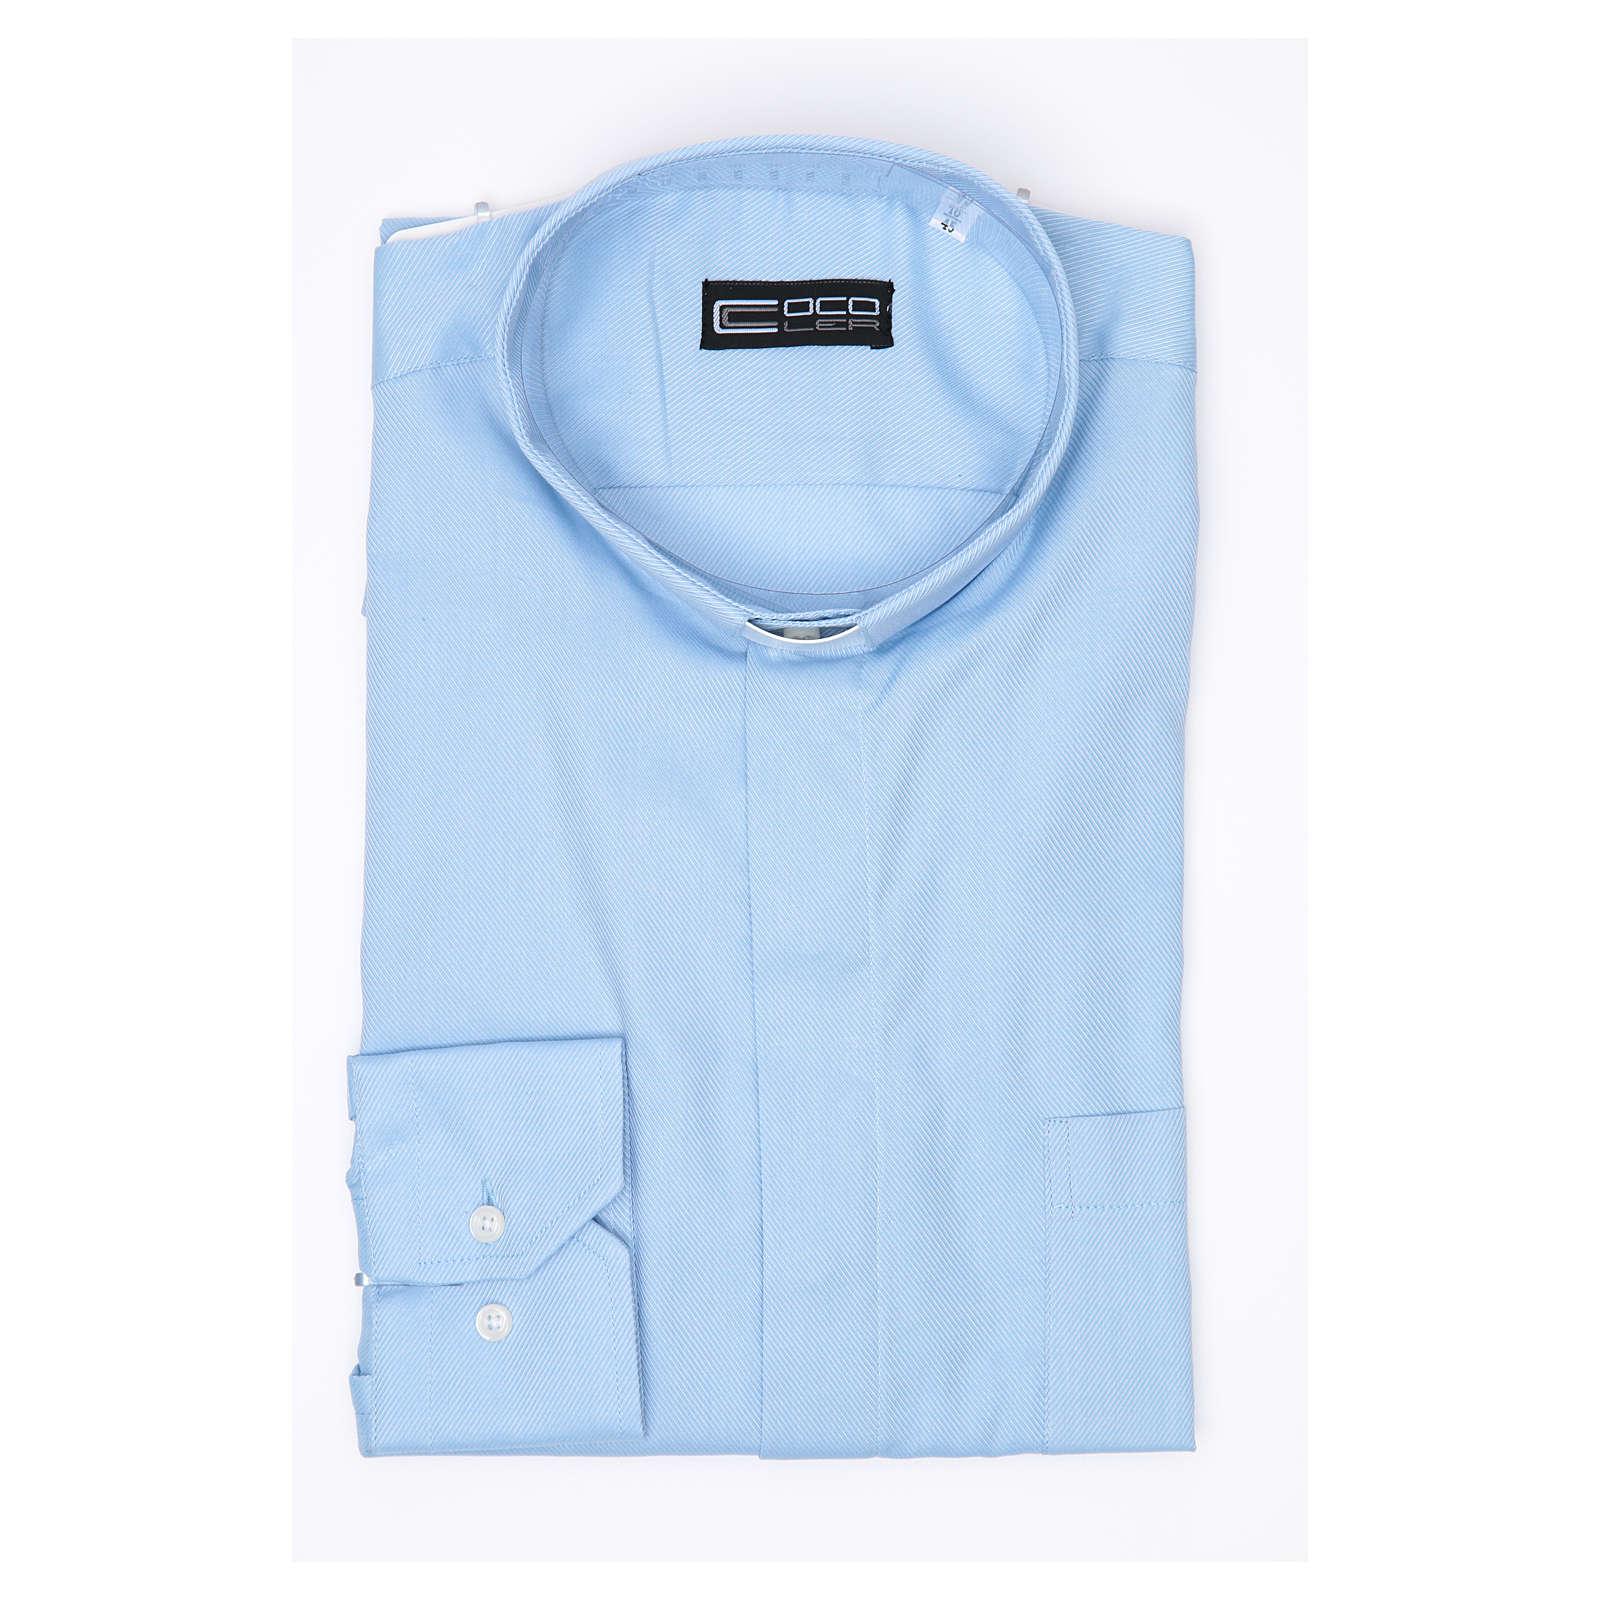 Camisa Clergy Manga Larga Planchado Facil Diagonal Mixto Algodón Celeste 4